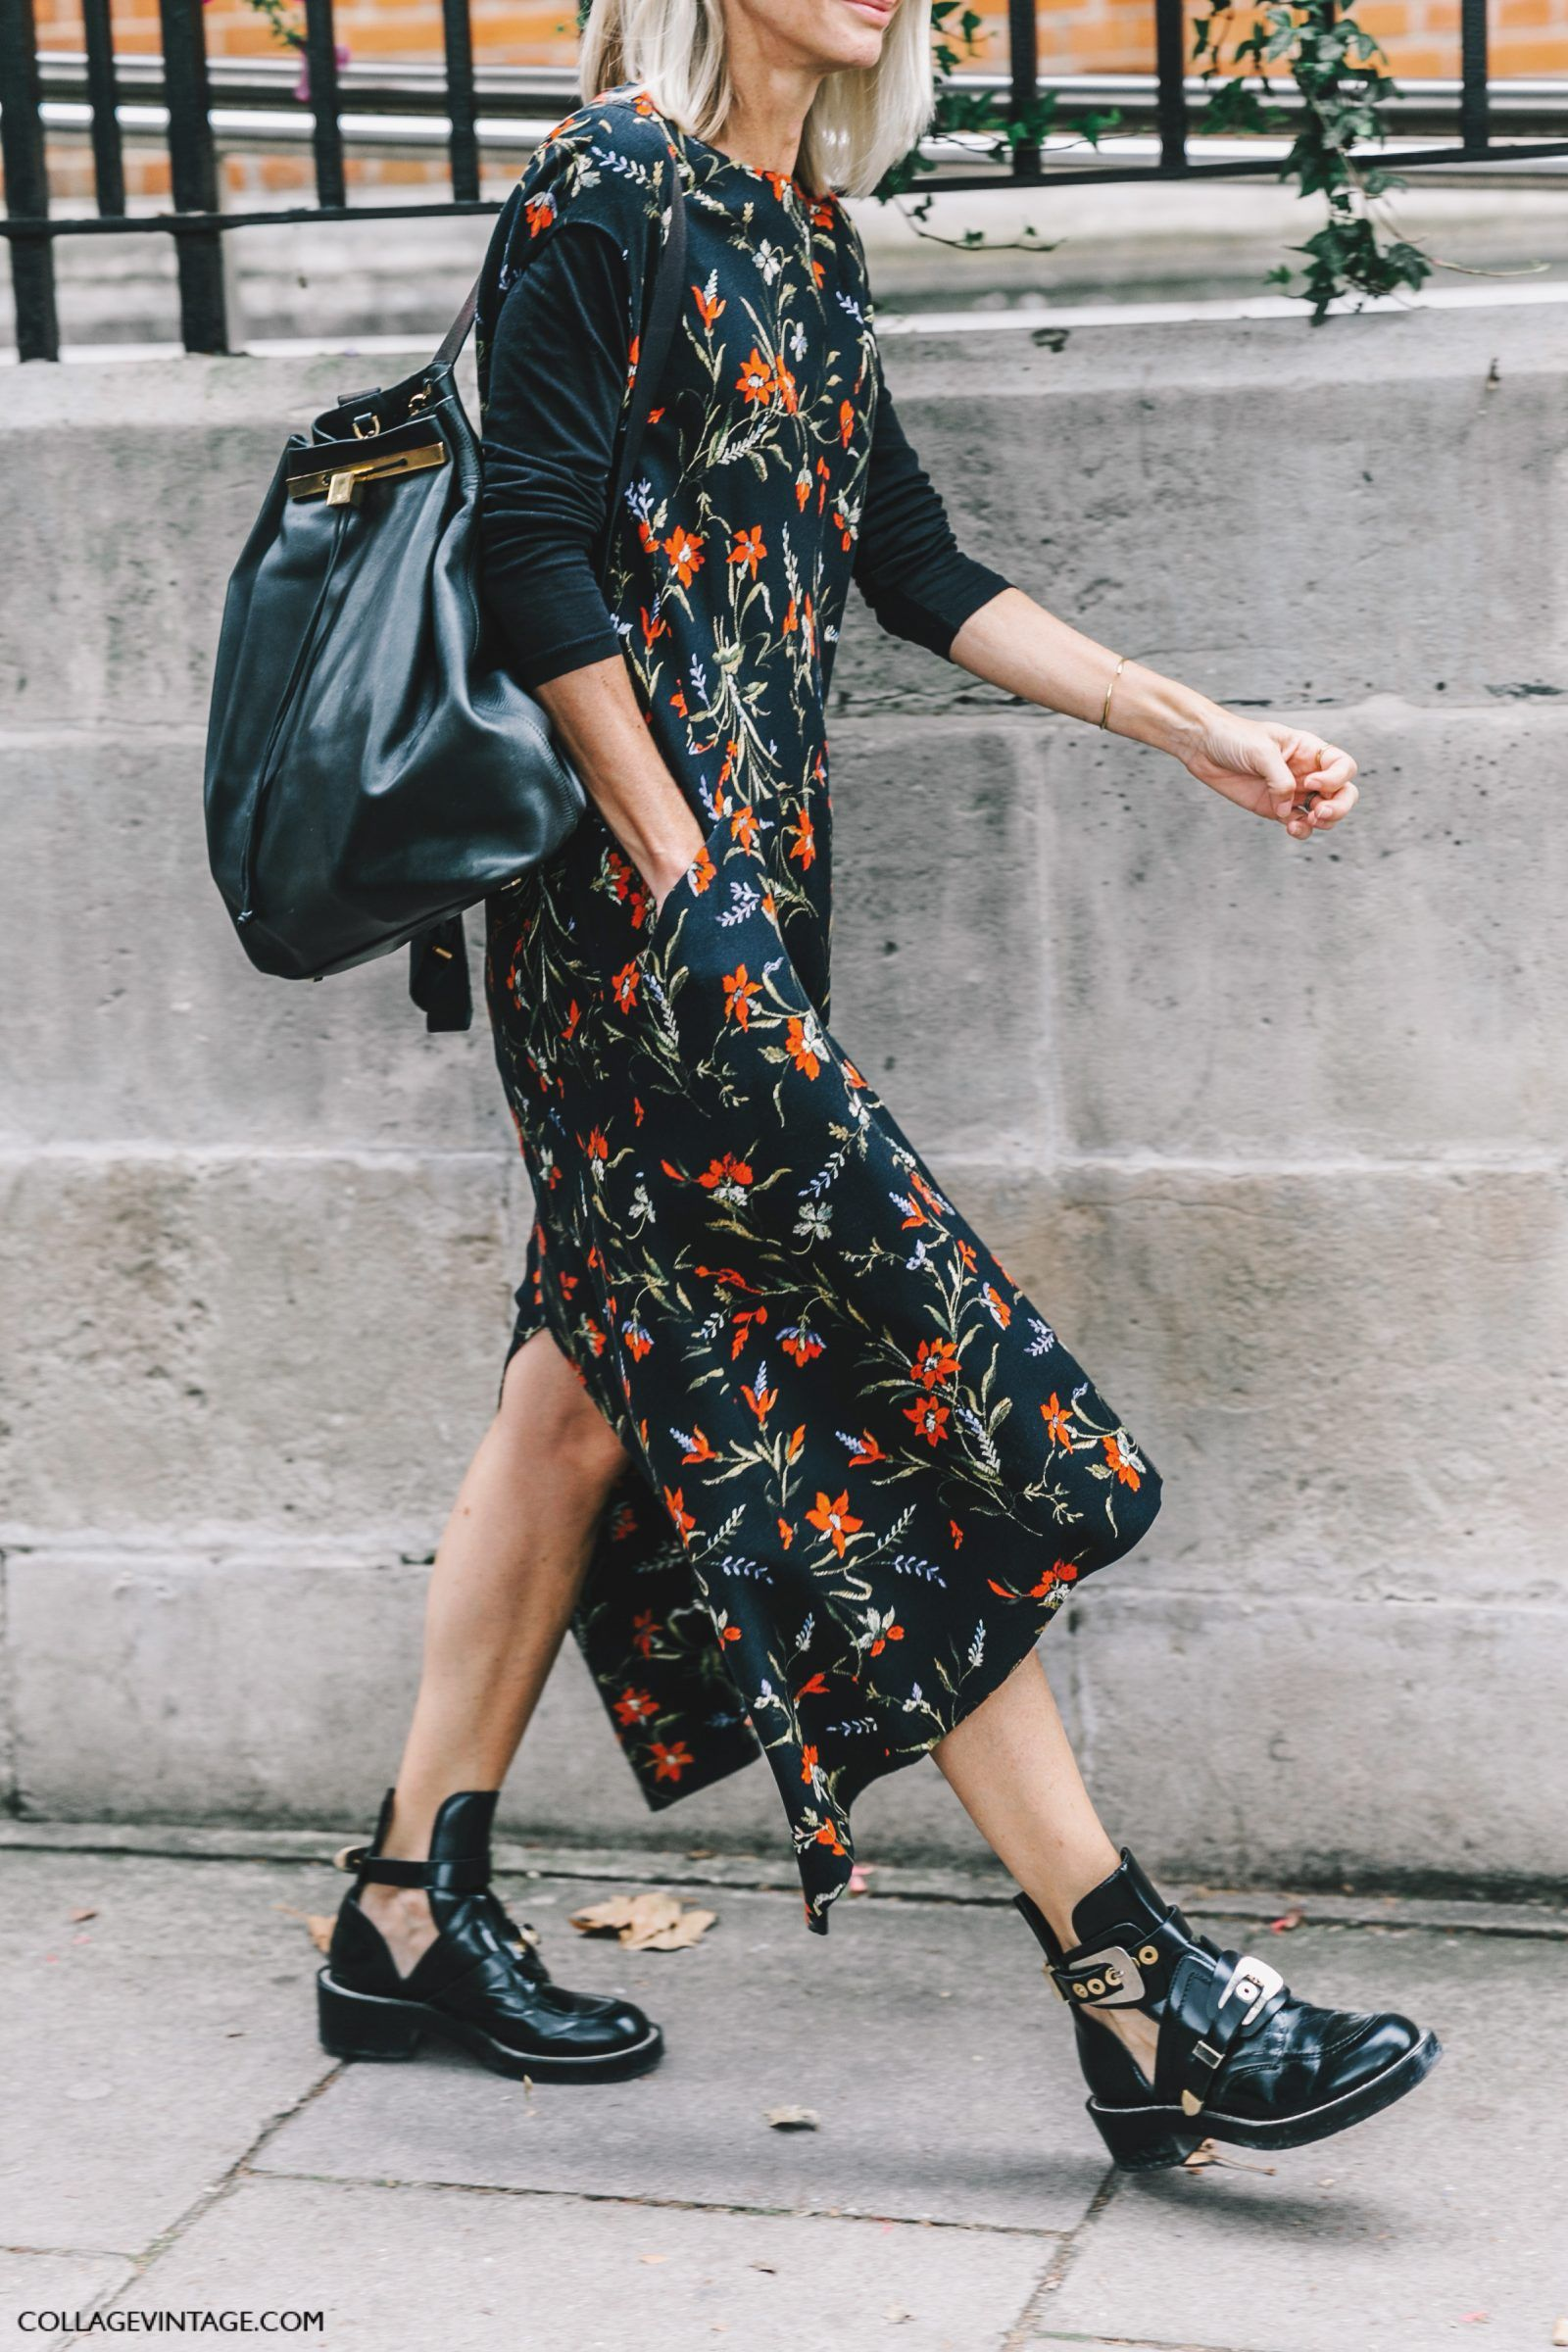 Slip dress, backpack, Balenciaga boots.